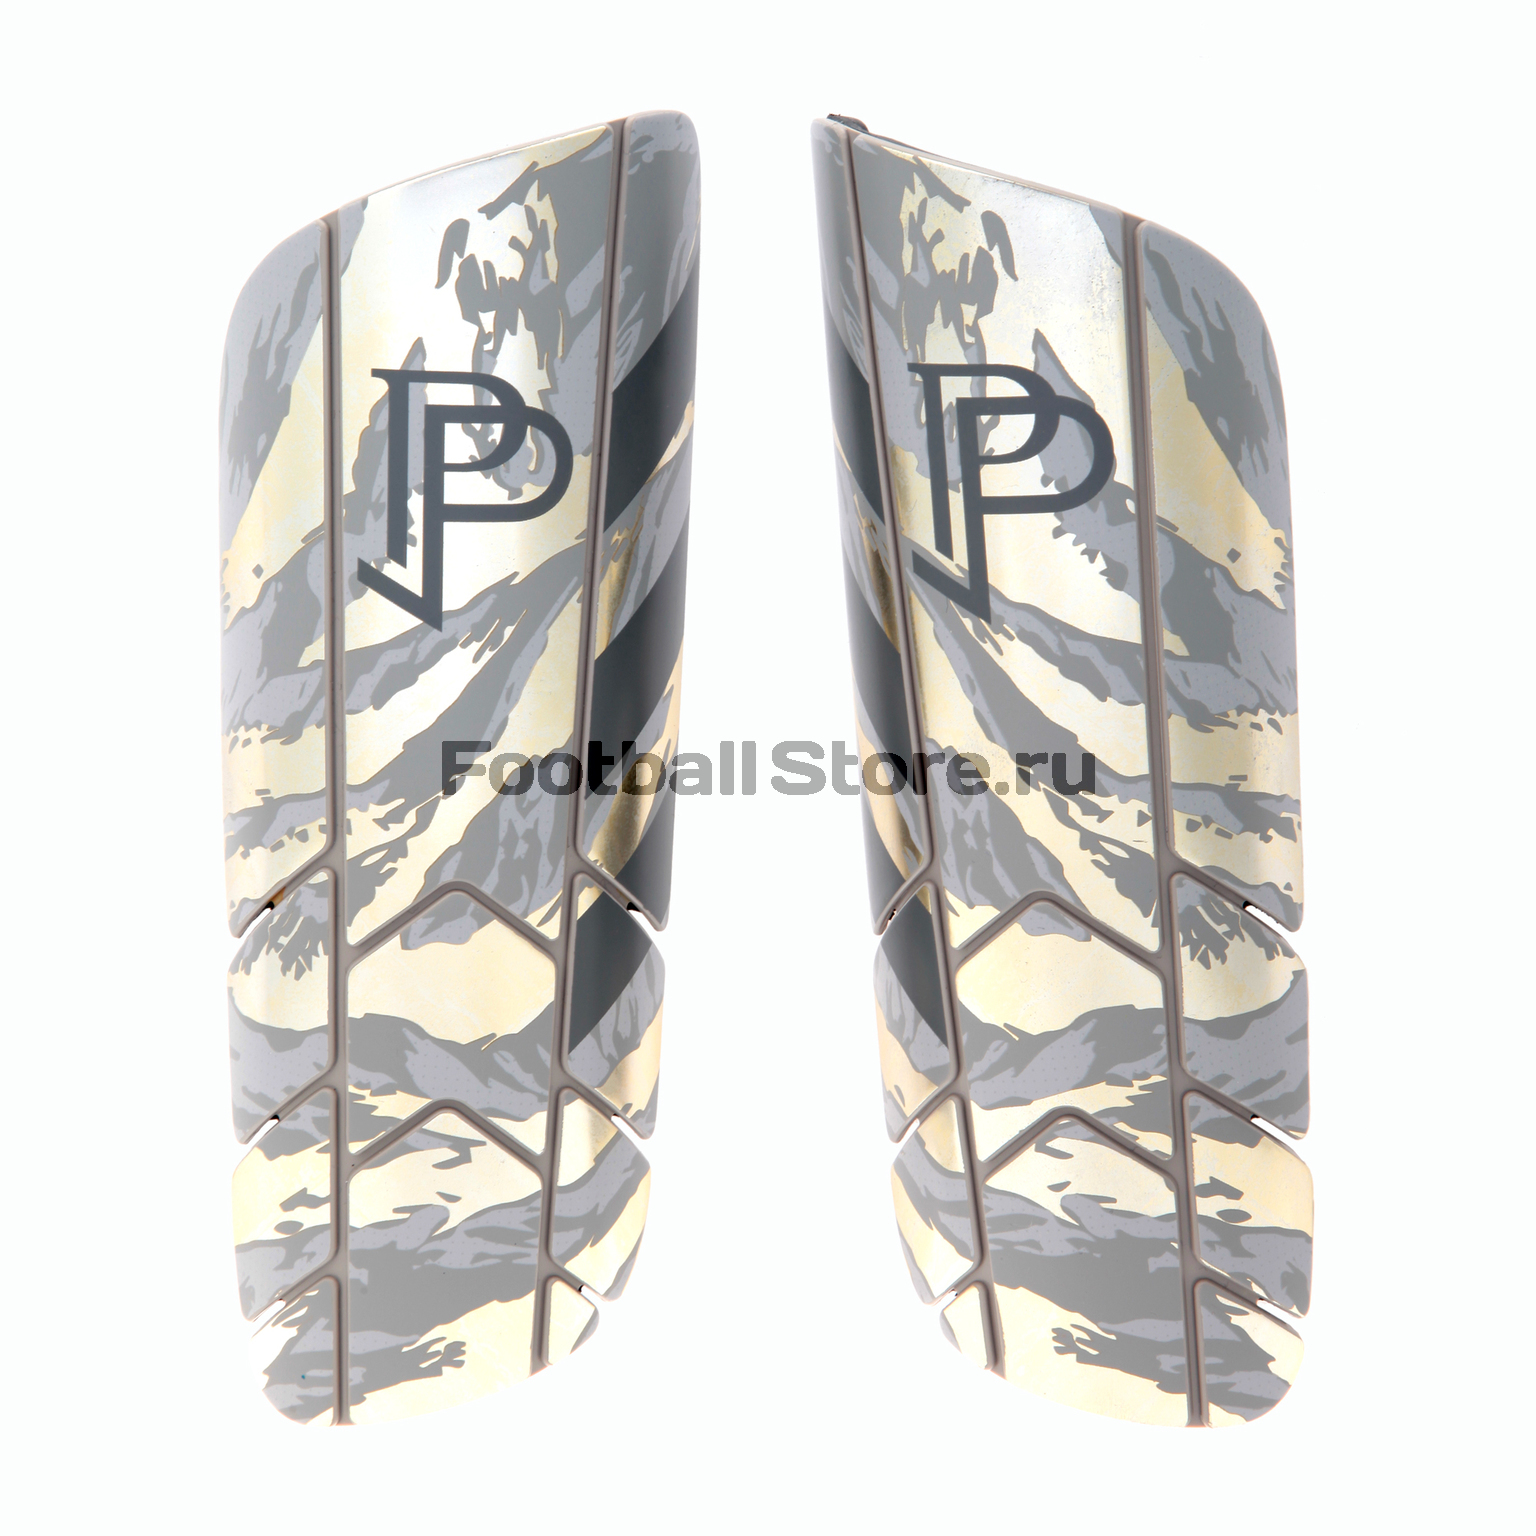 все цены на  Защита ног Adidas Щитки Adidas Ghost Graph Pogba BR5341  онлайн